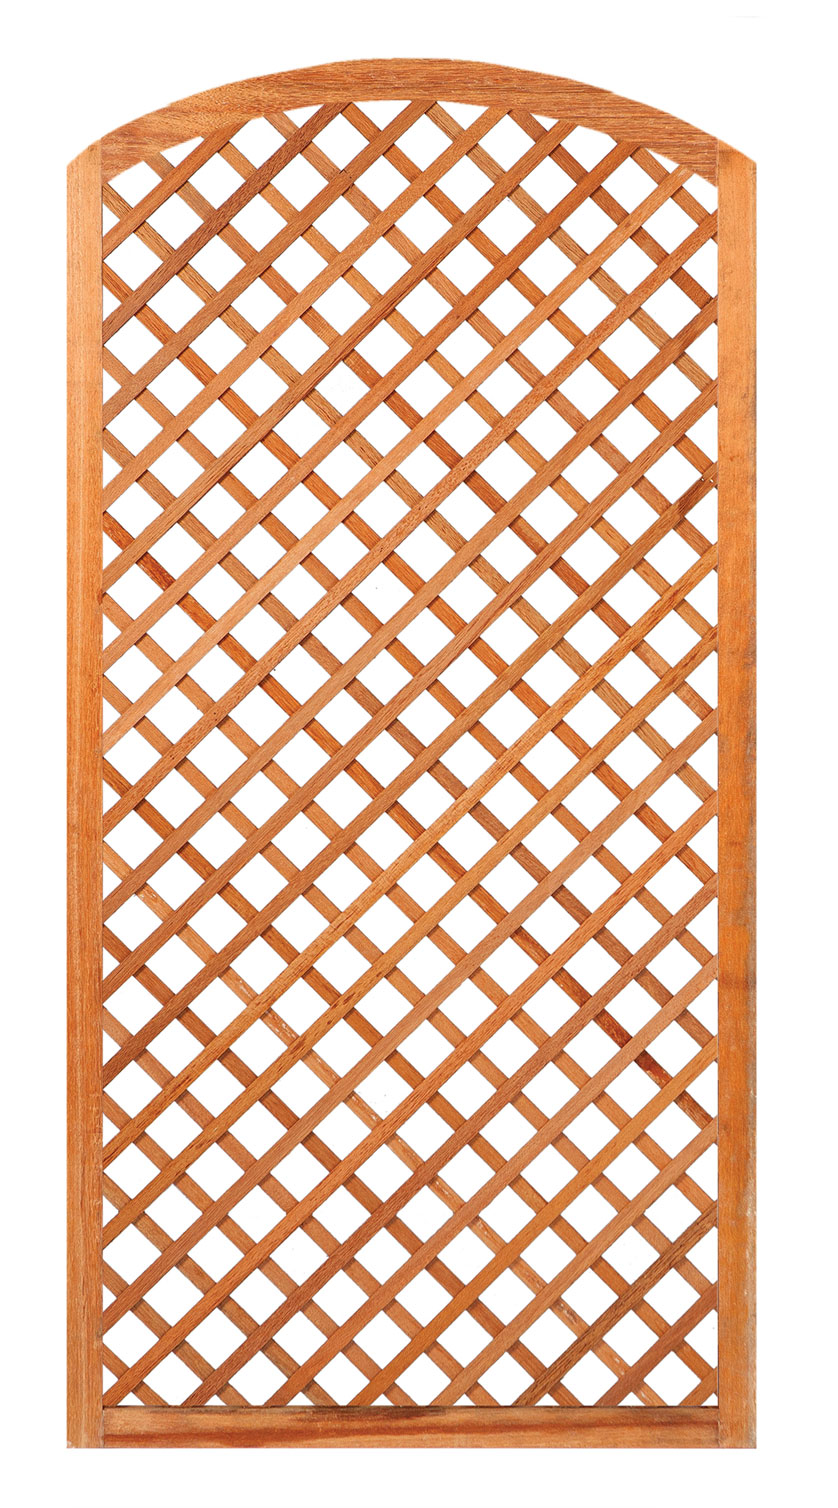 Hardhout lamel: 0.7x 2.0 cm lijstdikte: 3.0 x 5.0 cm 190(h) x 90(b) cm indonesian legal wood